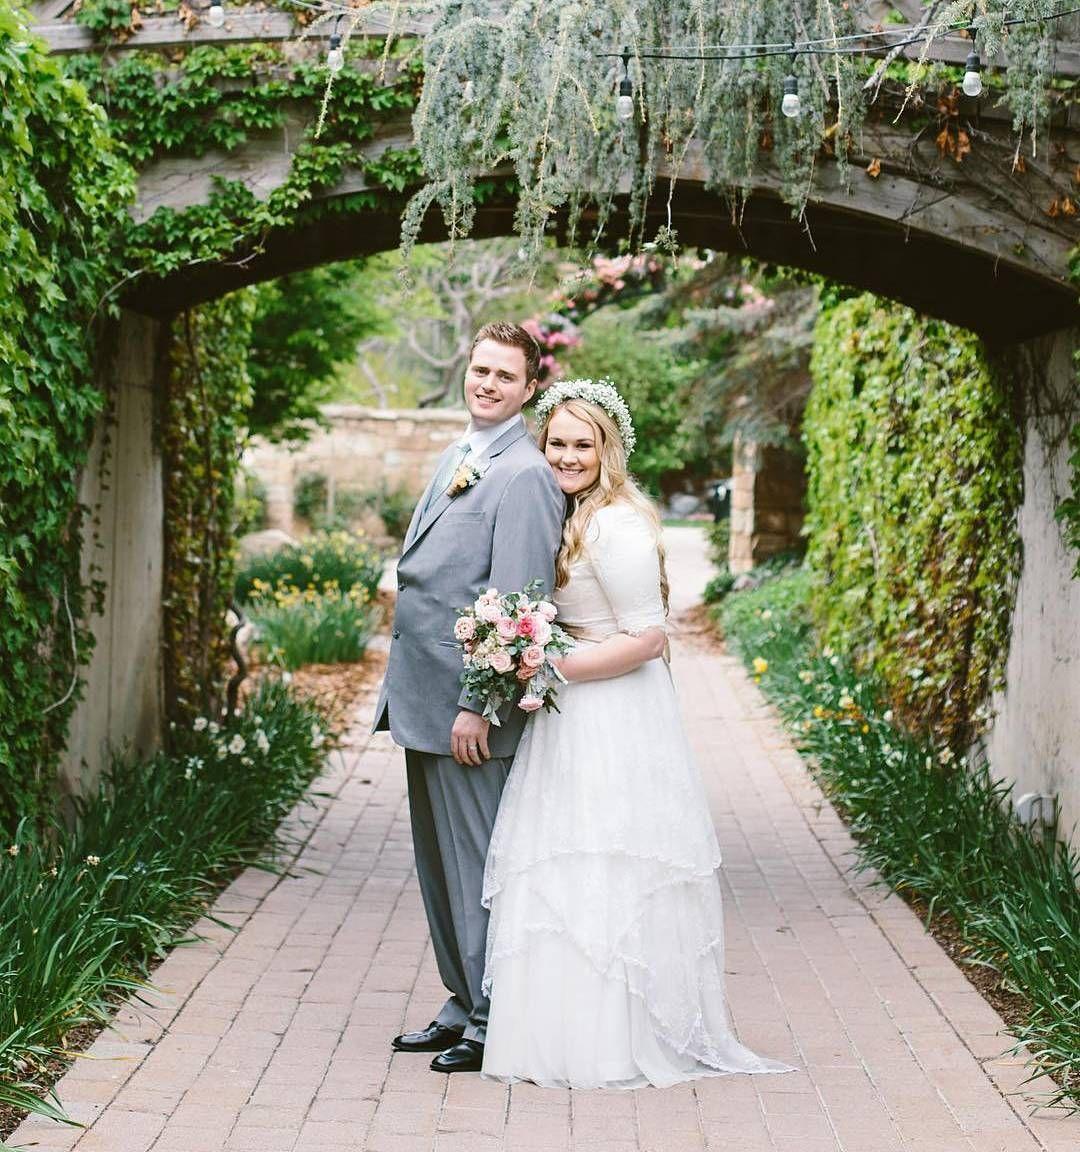 Utah Rental wedding dress. Modest, lace, boho wedding dress Gowns By ...